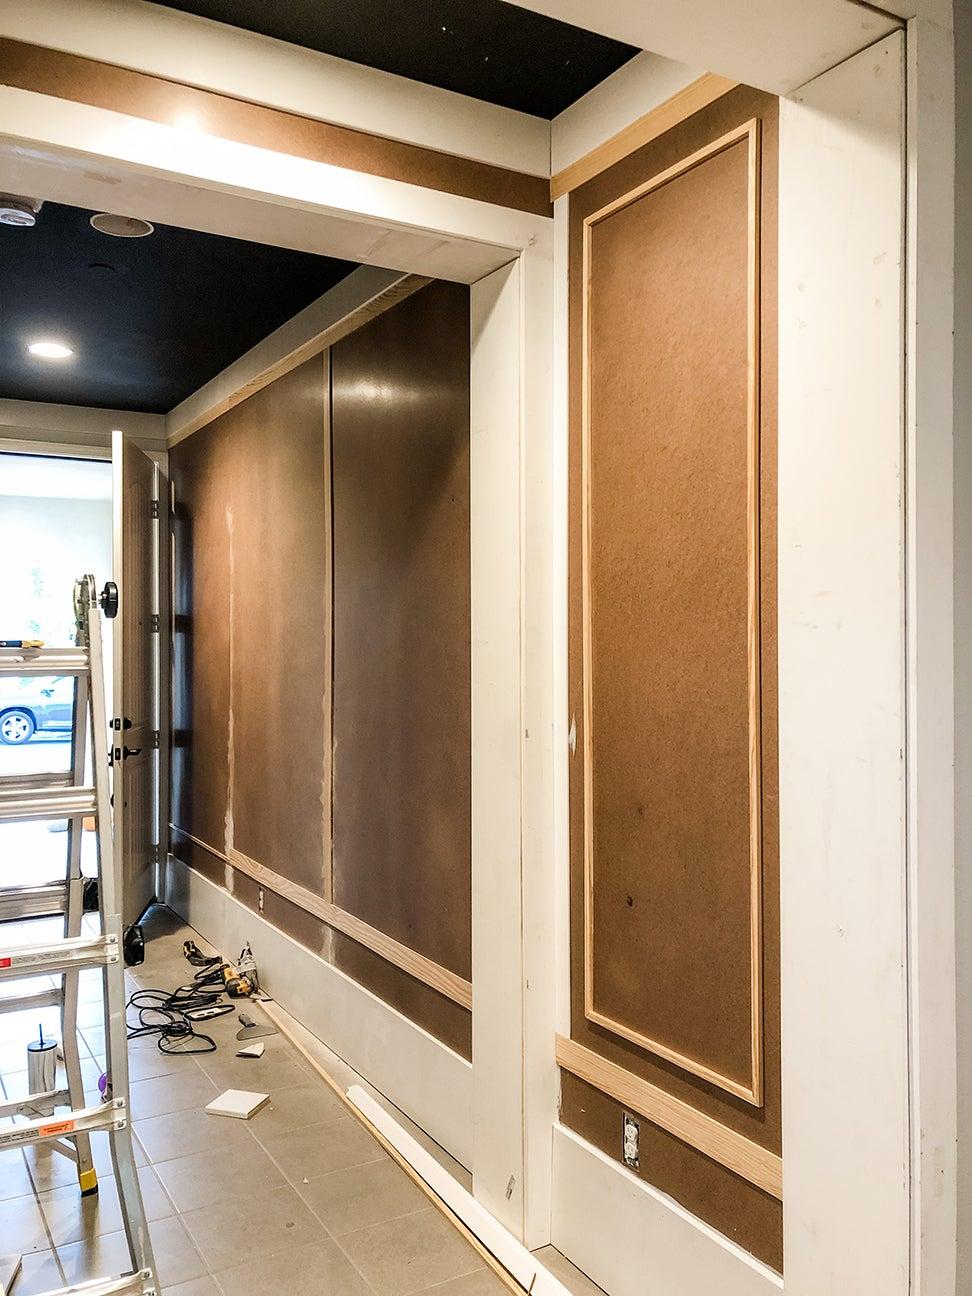 brown wall paneling